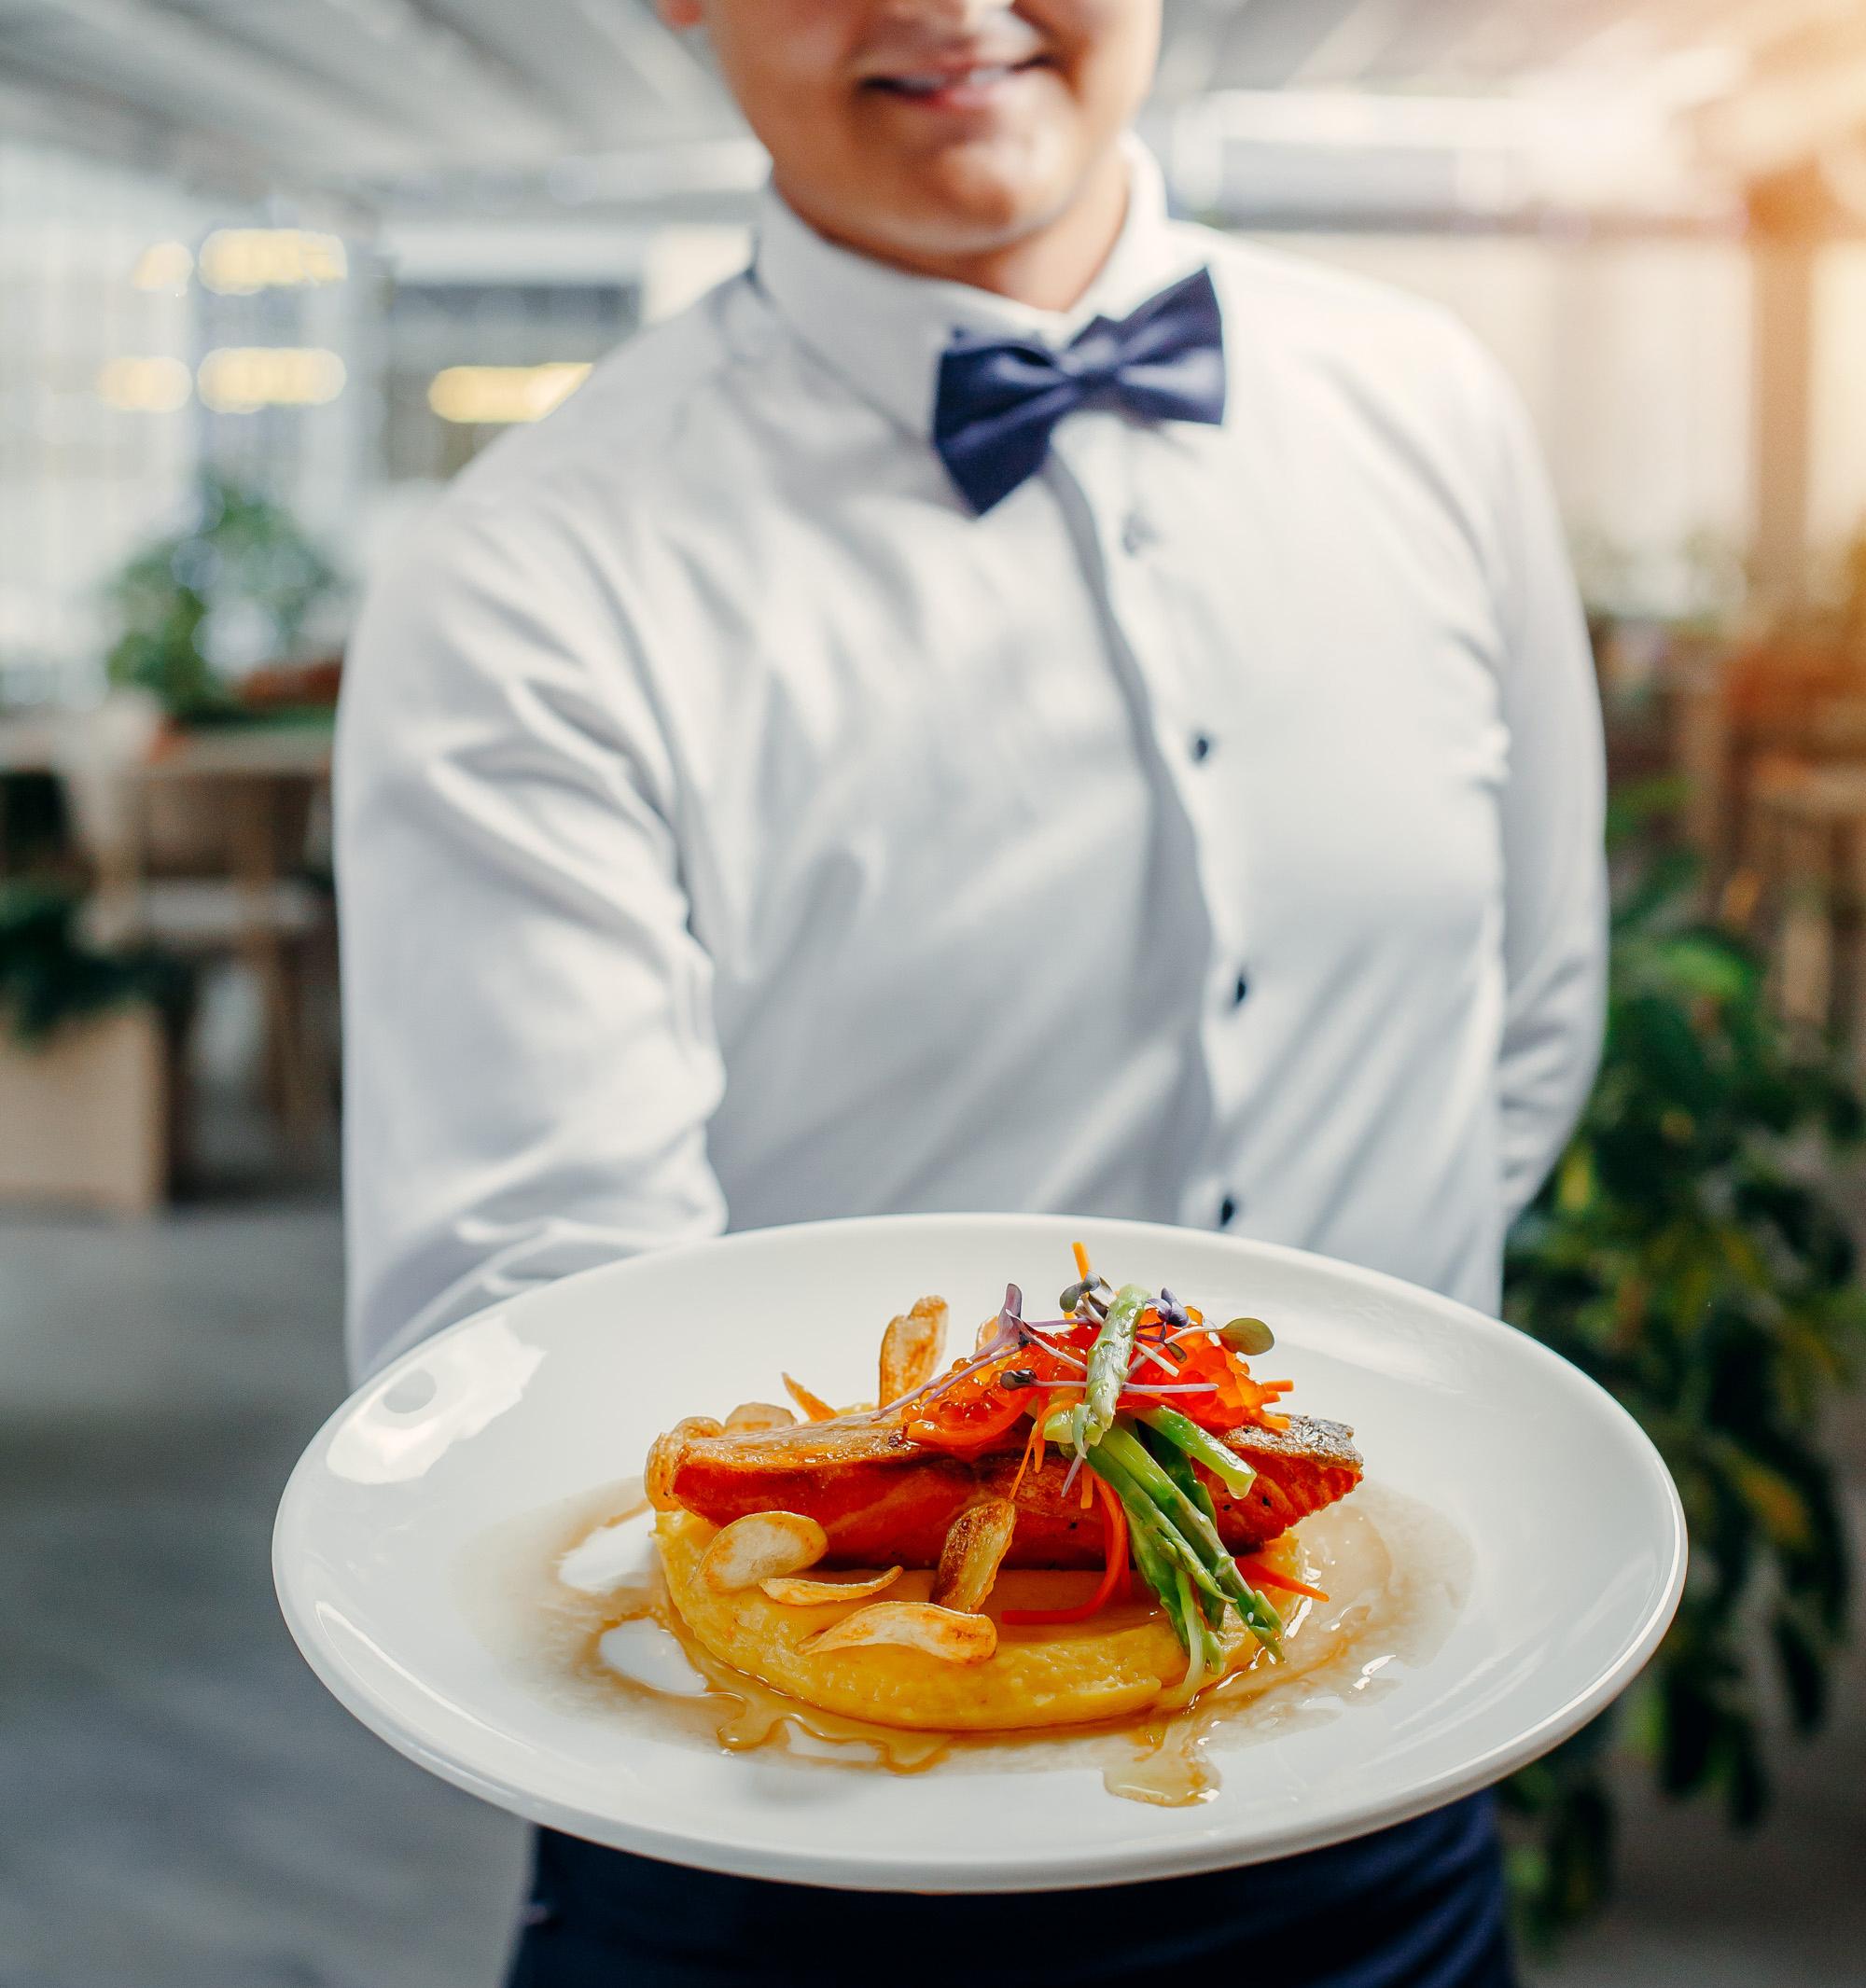 Idee Cadeau Diner Dans Un Restaurant Etoile Sonkado